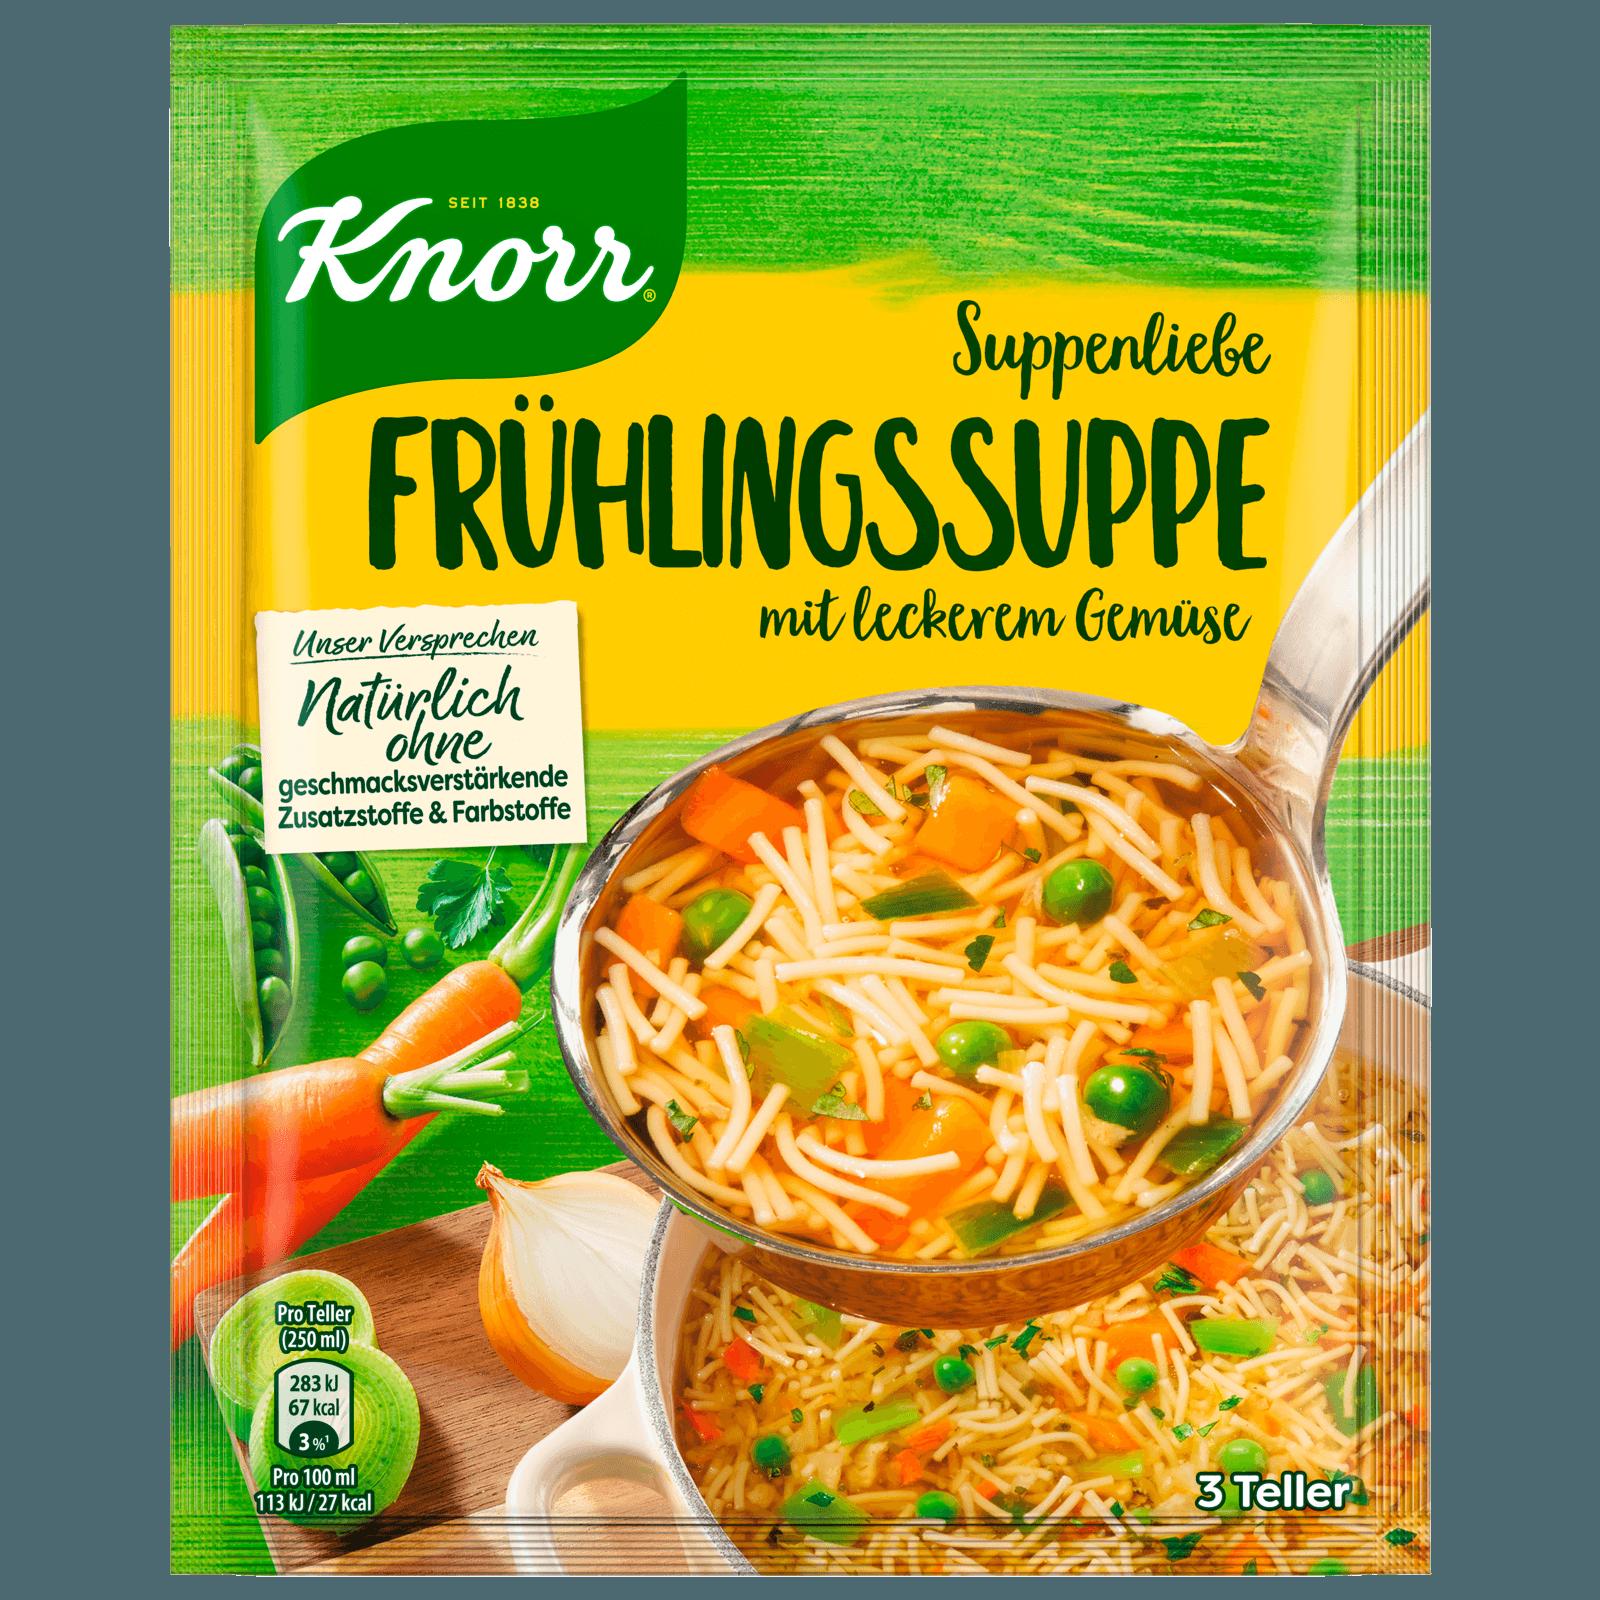 Knorr Suppenliebe Frühlings Suppe 3 Teller